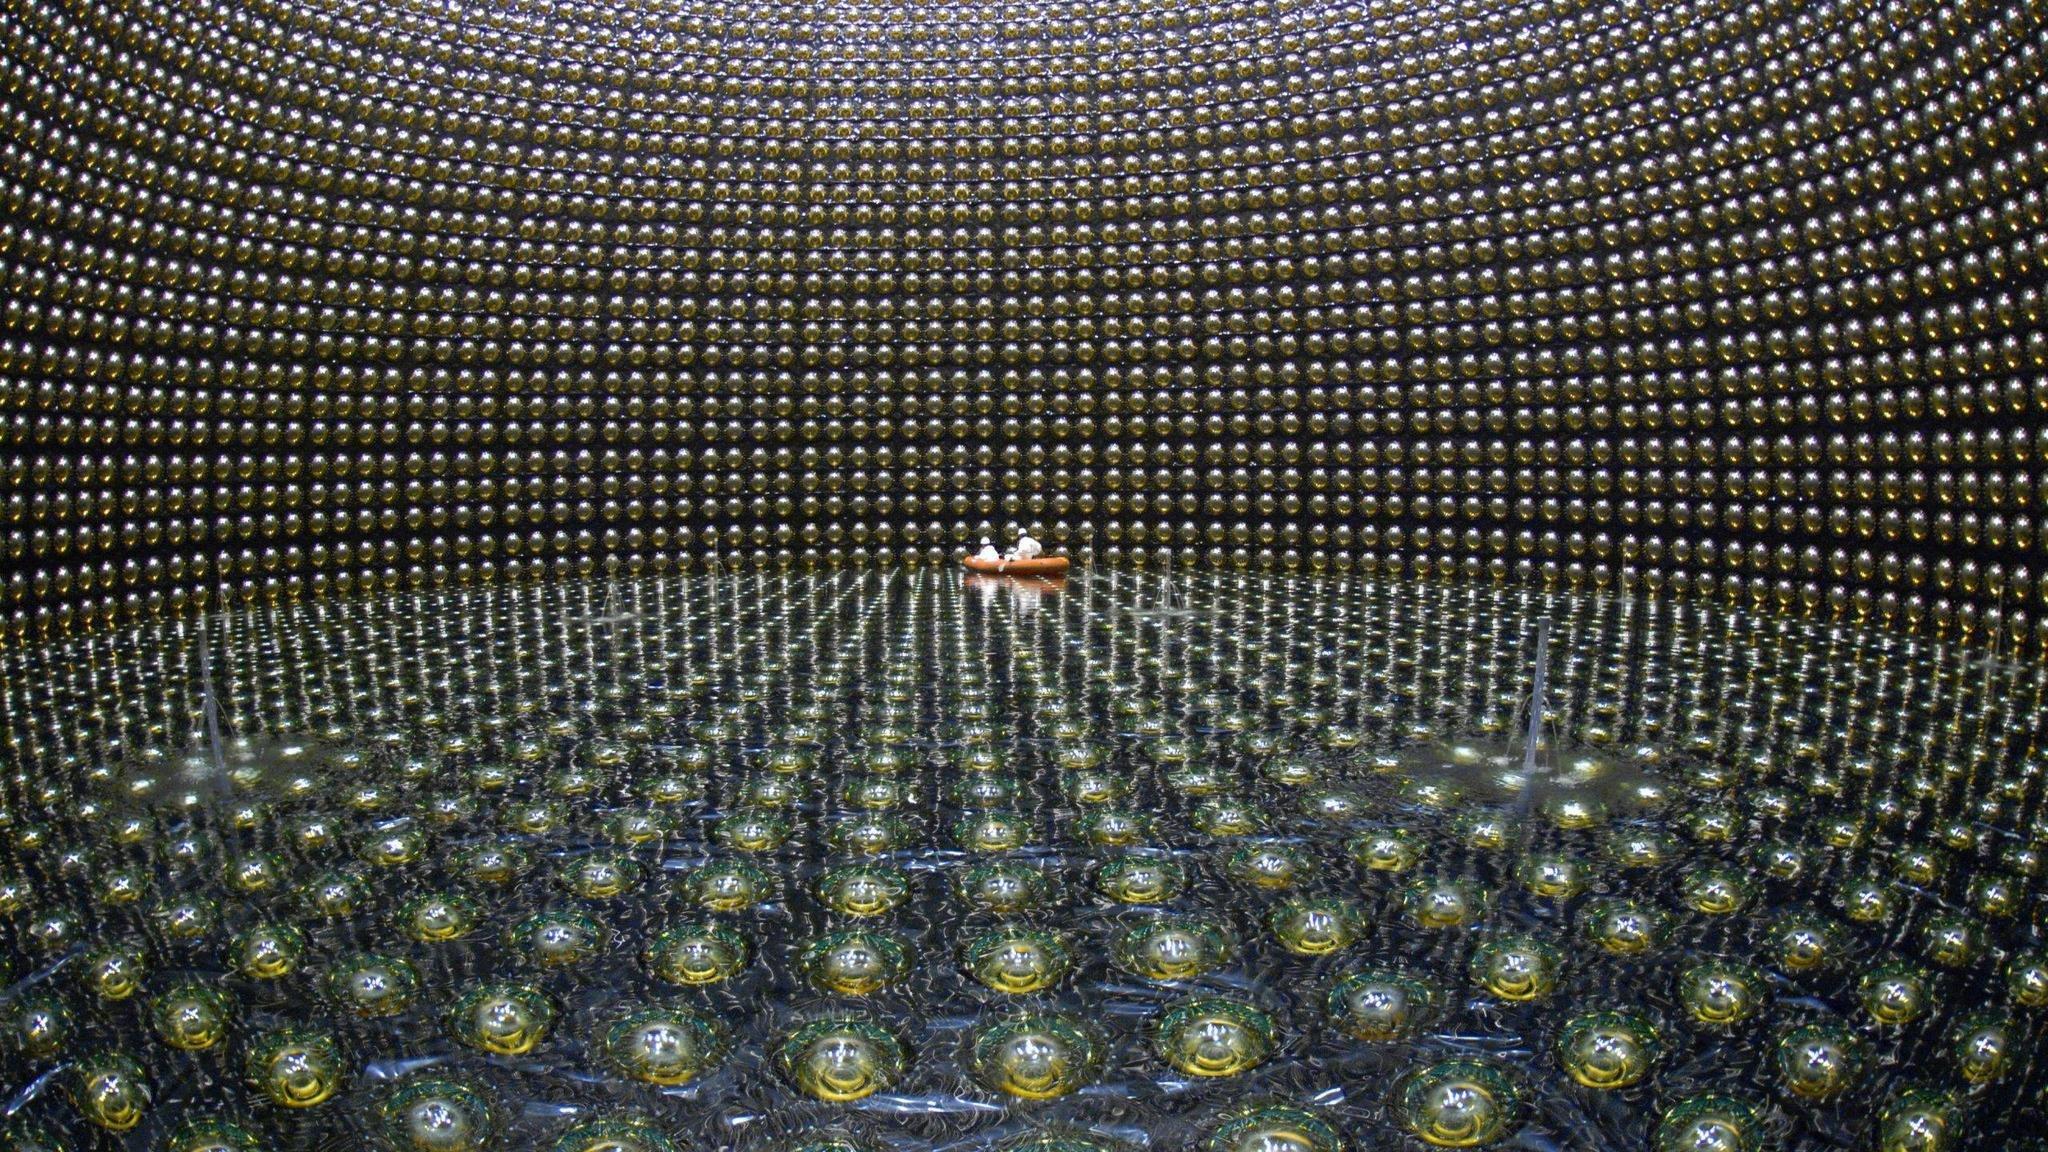 Tuning the neutrino detector wallpapers 2048x1152